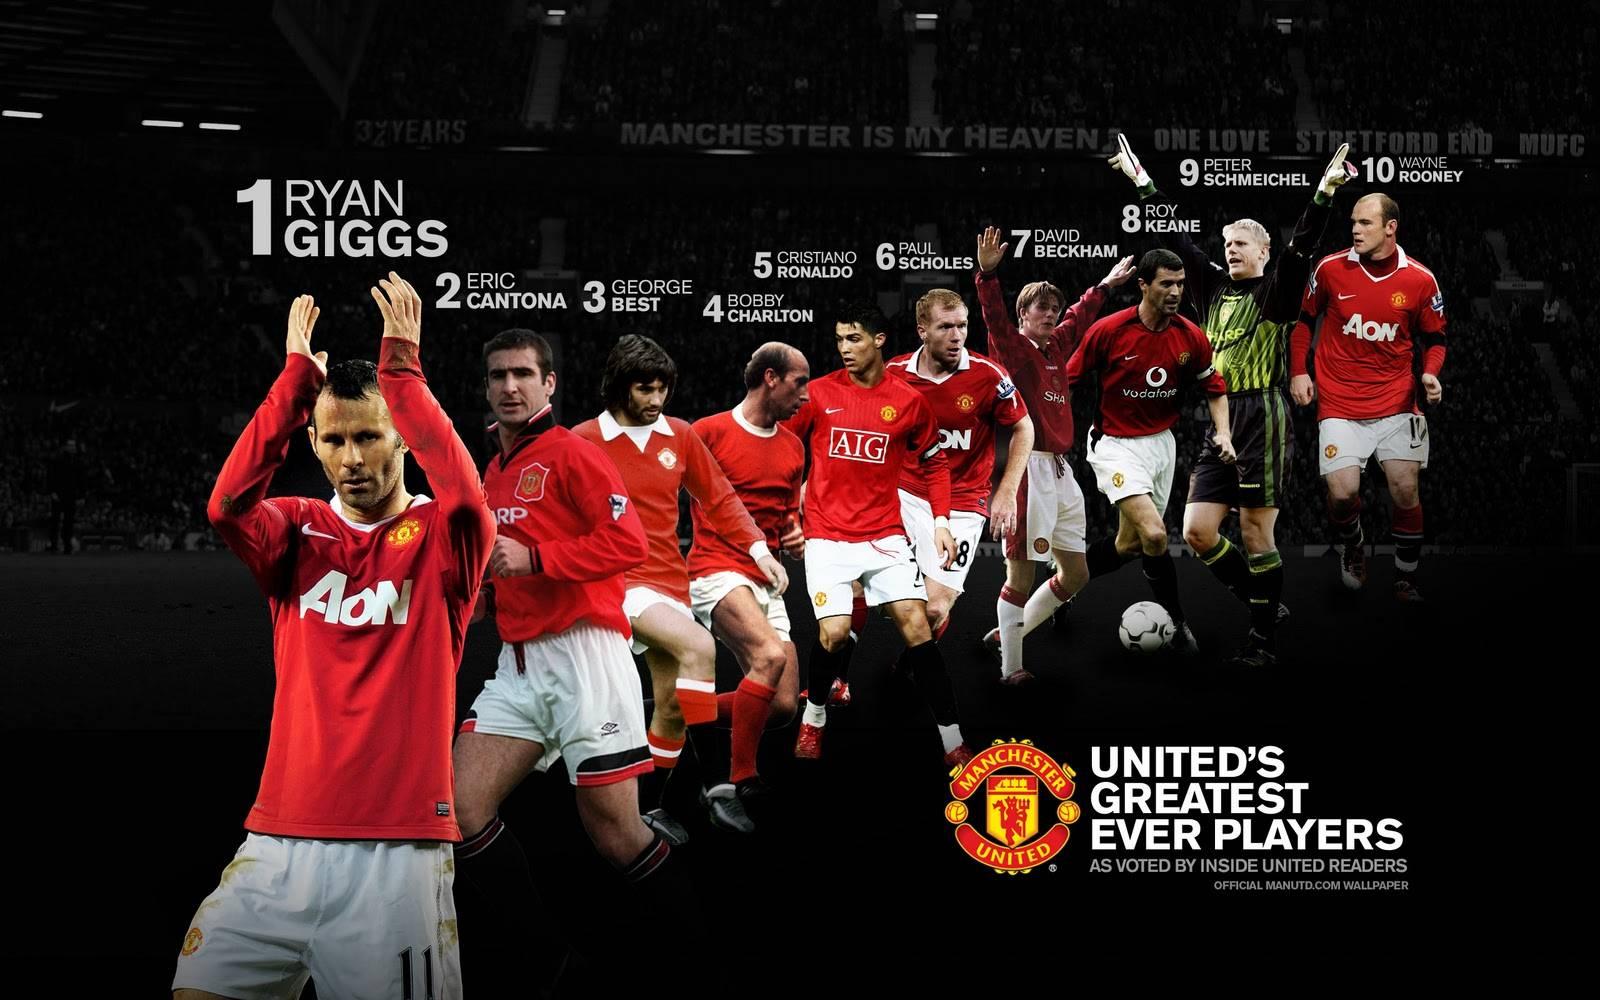 Manchester united logo wallpapers hd 2016 wallpaper cave - Manchester united latest wallpapers hd ...